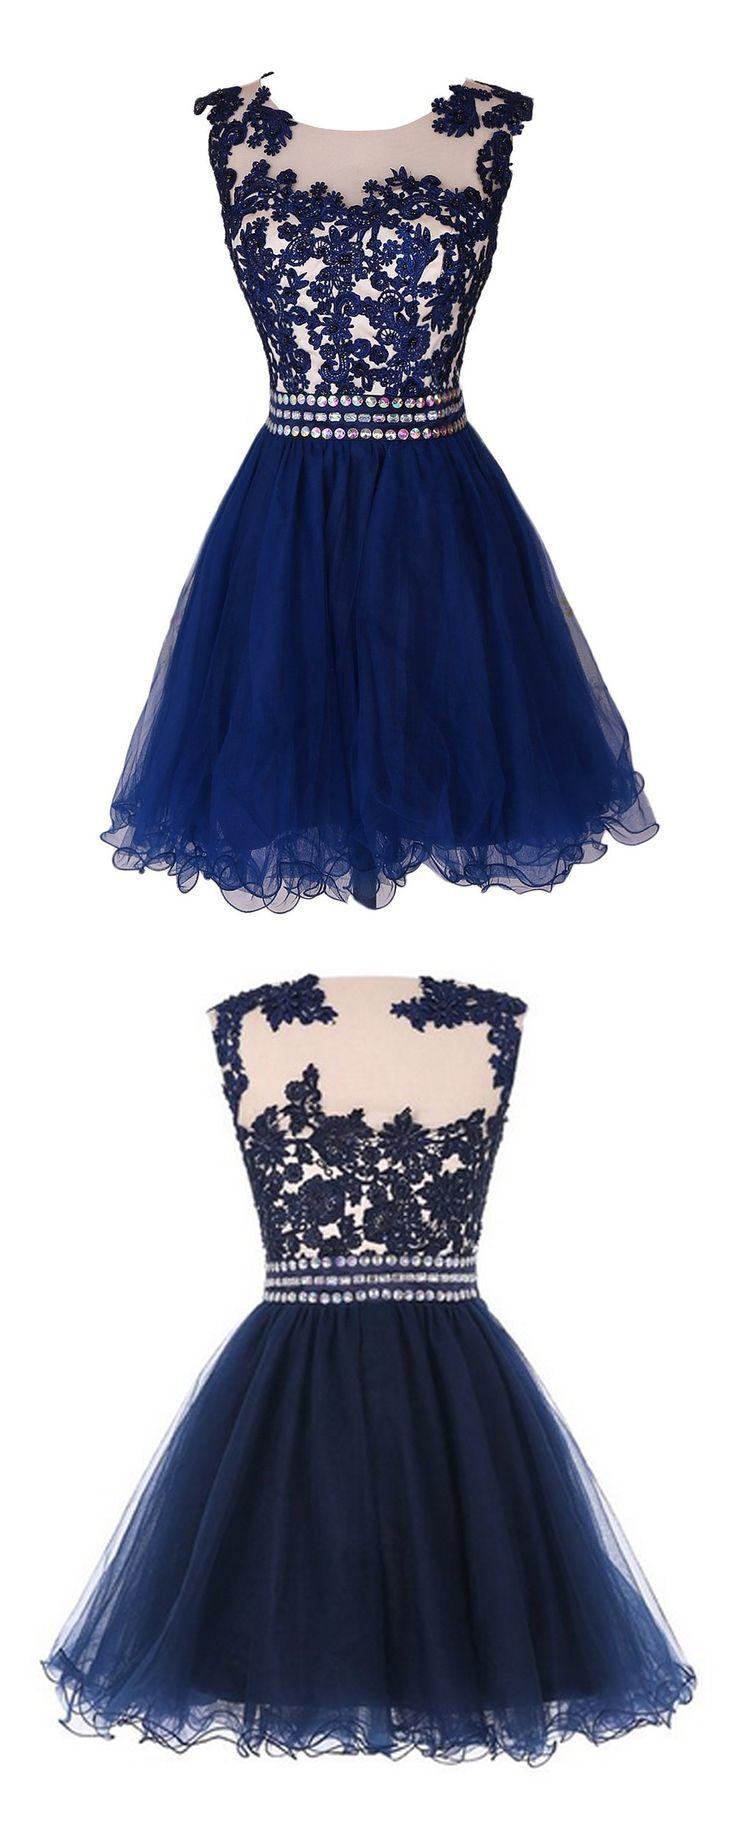 Navy Blue Lace Short Prom Dress Homecoming Dress Dresses